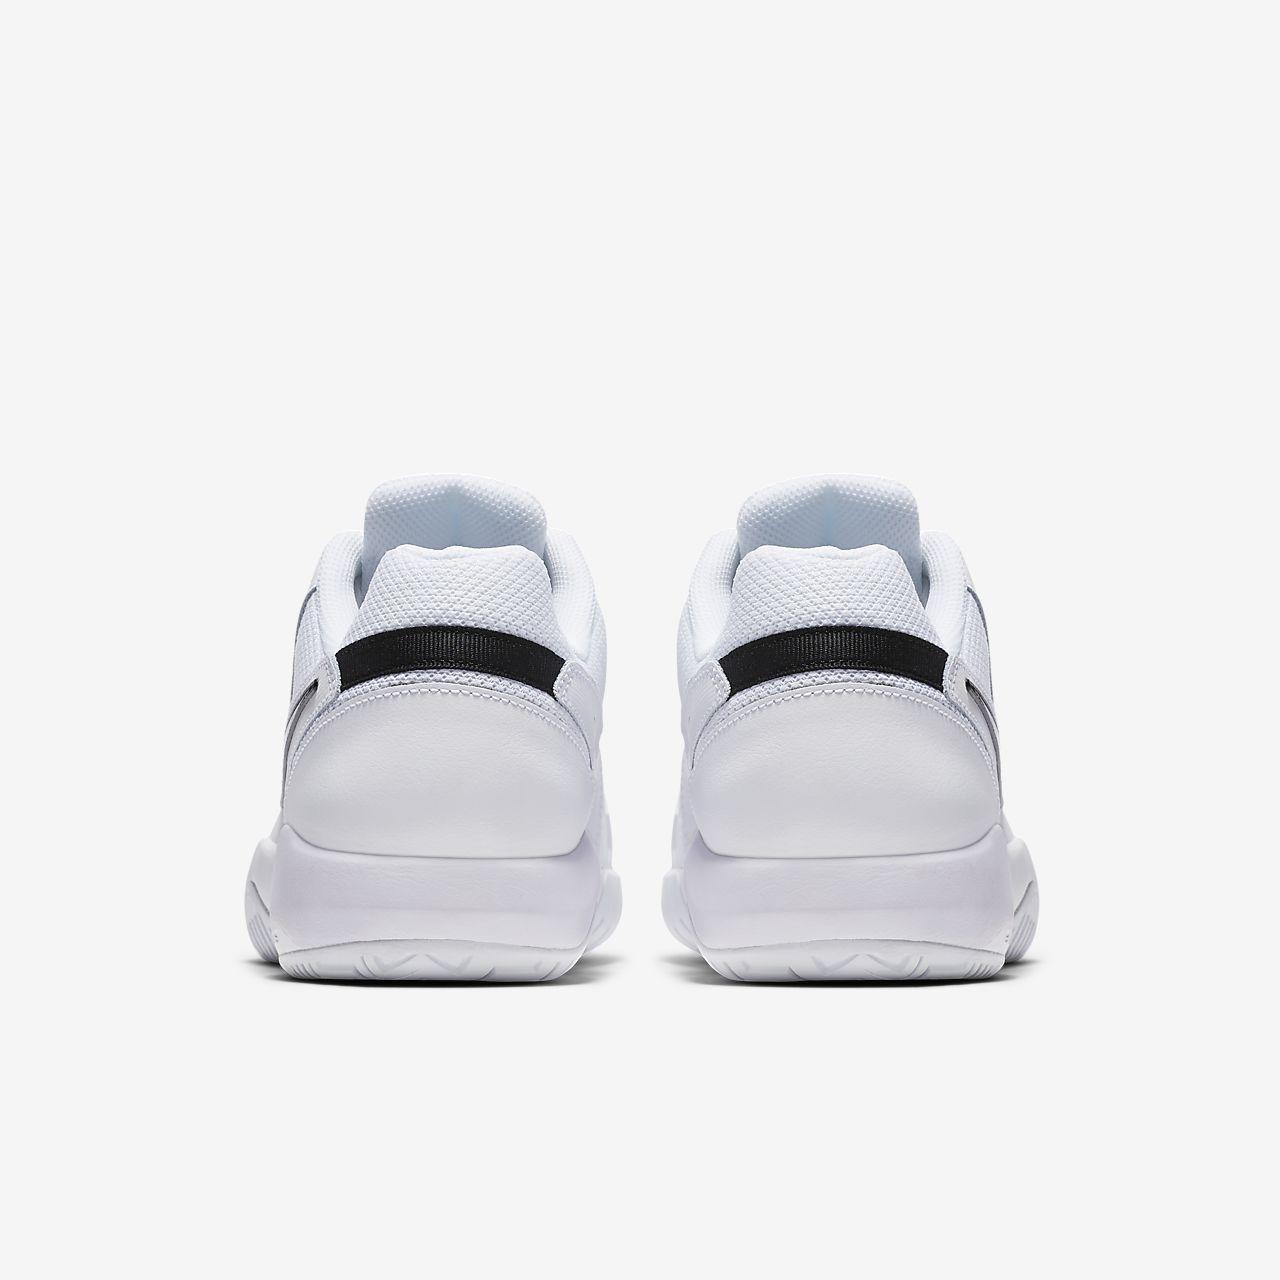 best loved 85f1b 14e92 Nike Court Air Zoom resistance Chaussures De Tennis Hommes Noir 918194 010  Articles de tennis